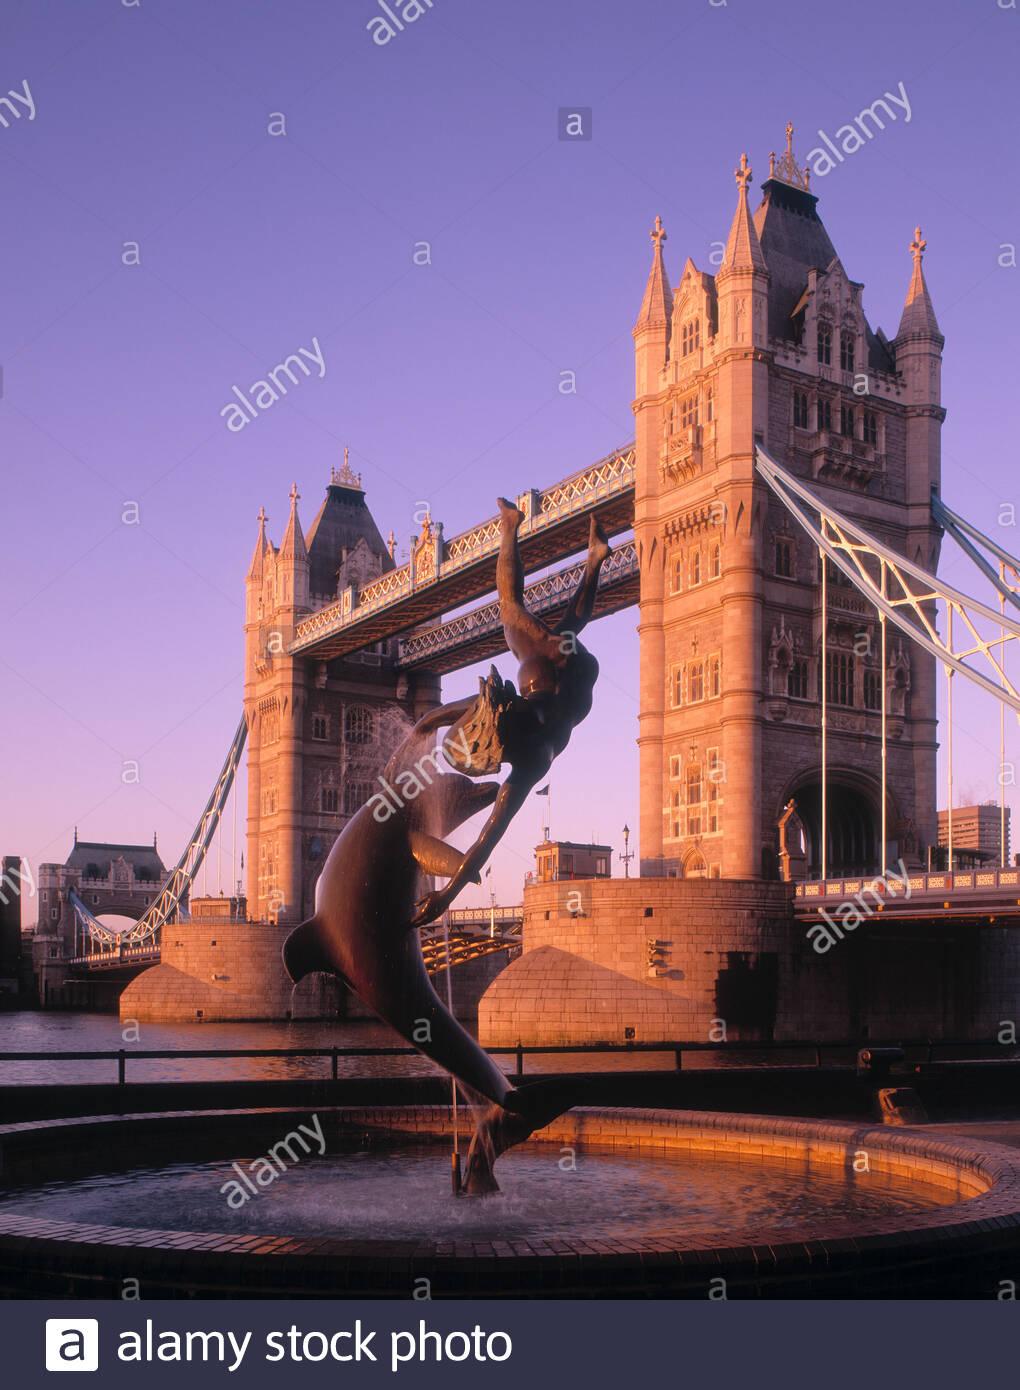 Tower Bridge London at dawn - Stock Image